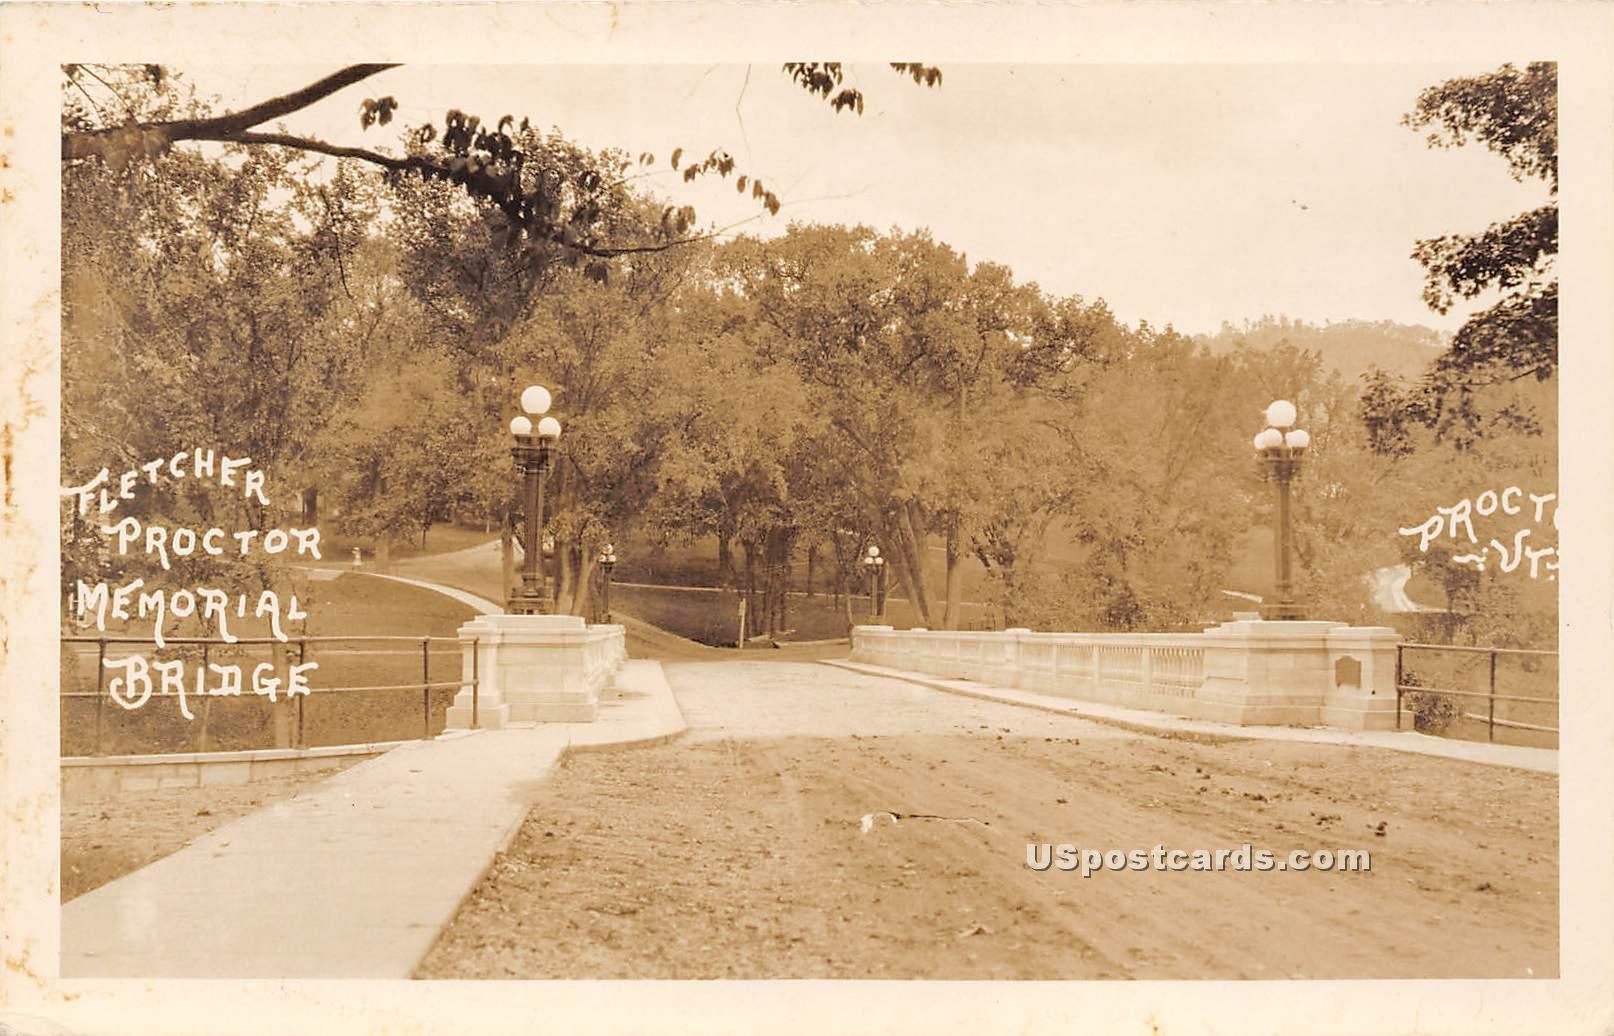 Fletcher Proctor Memorial Bridge - Vermont VT Postcard